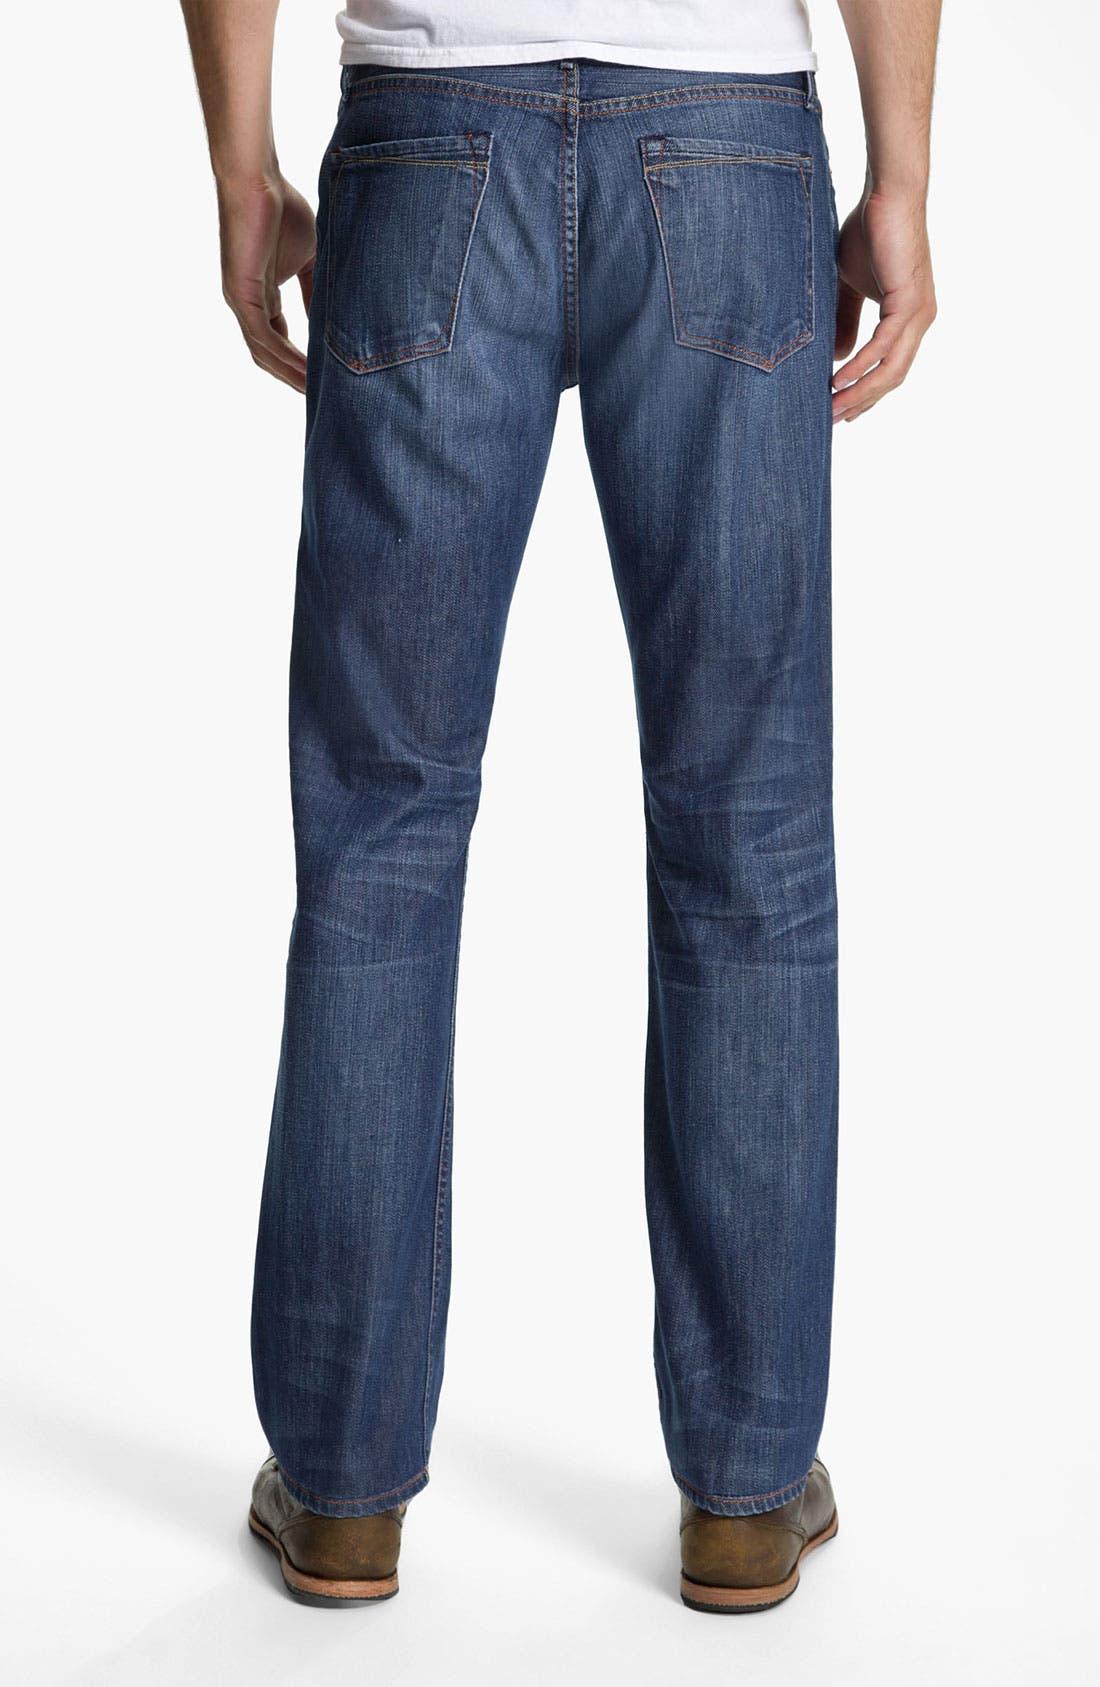 Alternate Image 2  - Earnest Sewn 'Dexter' Relaxed Leg Jeans (Burton)